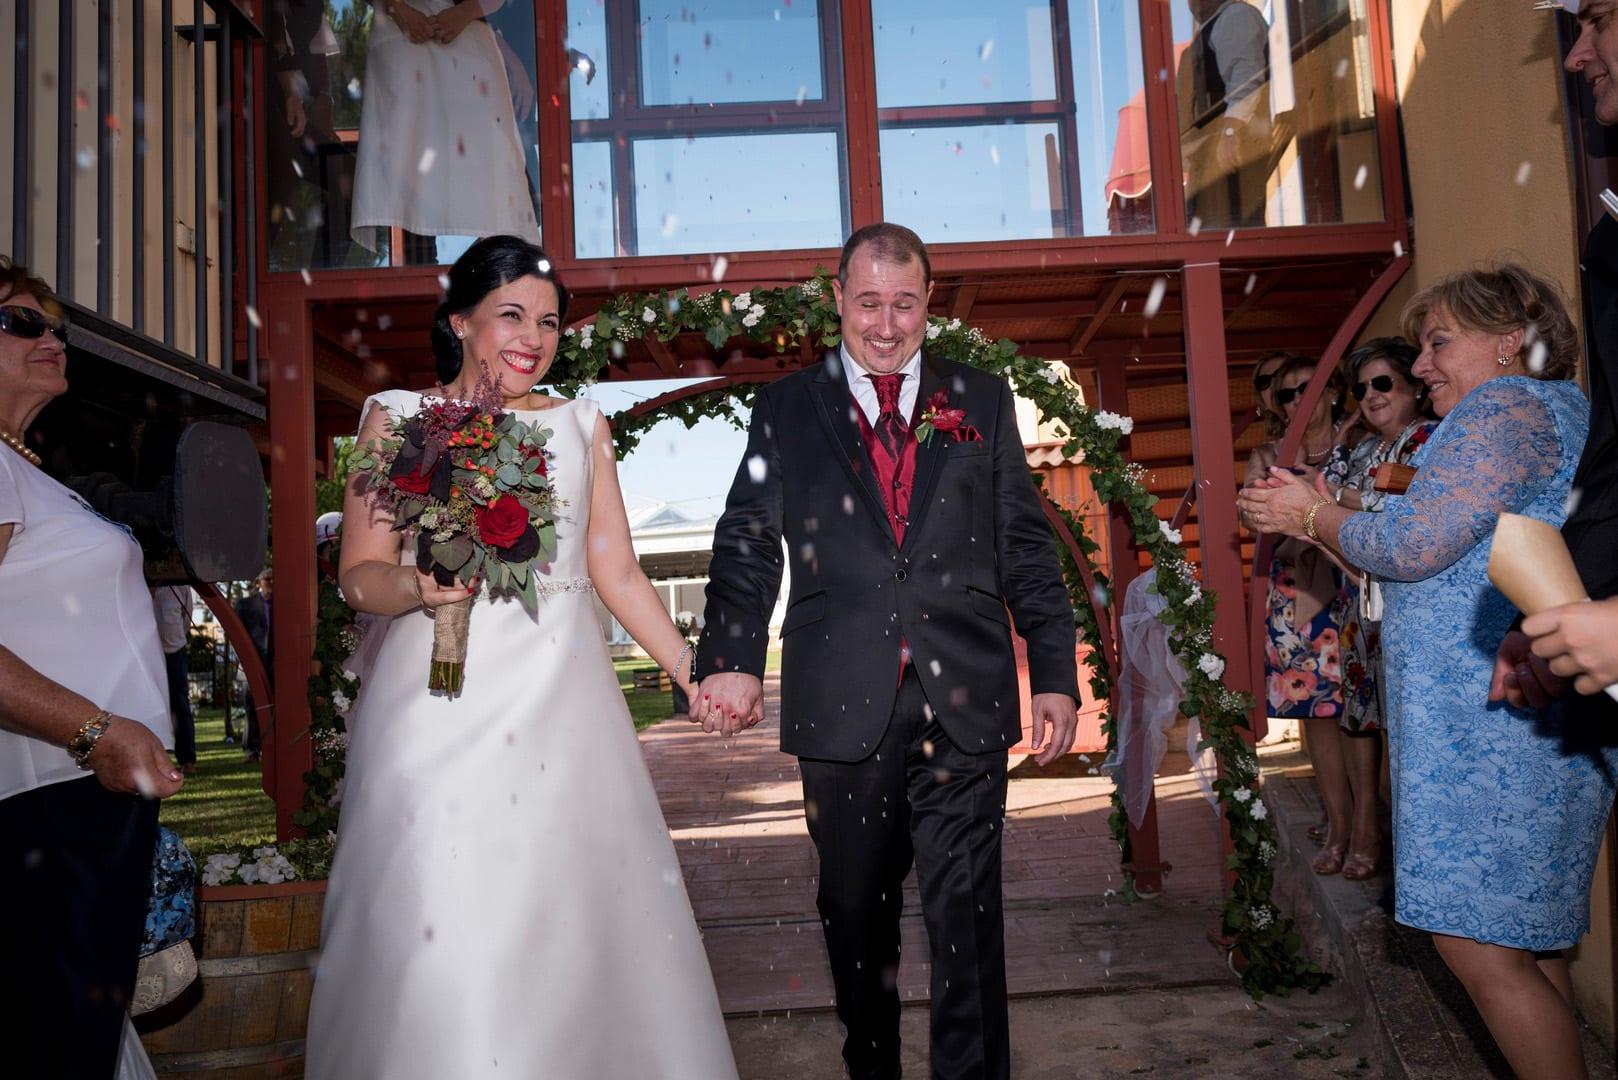 arroz ZAZU-boda-divertida-en-rojo-Segovia UNA BODA DIVERTIDA EN SEGOVIA